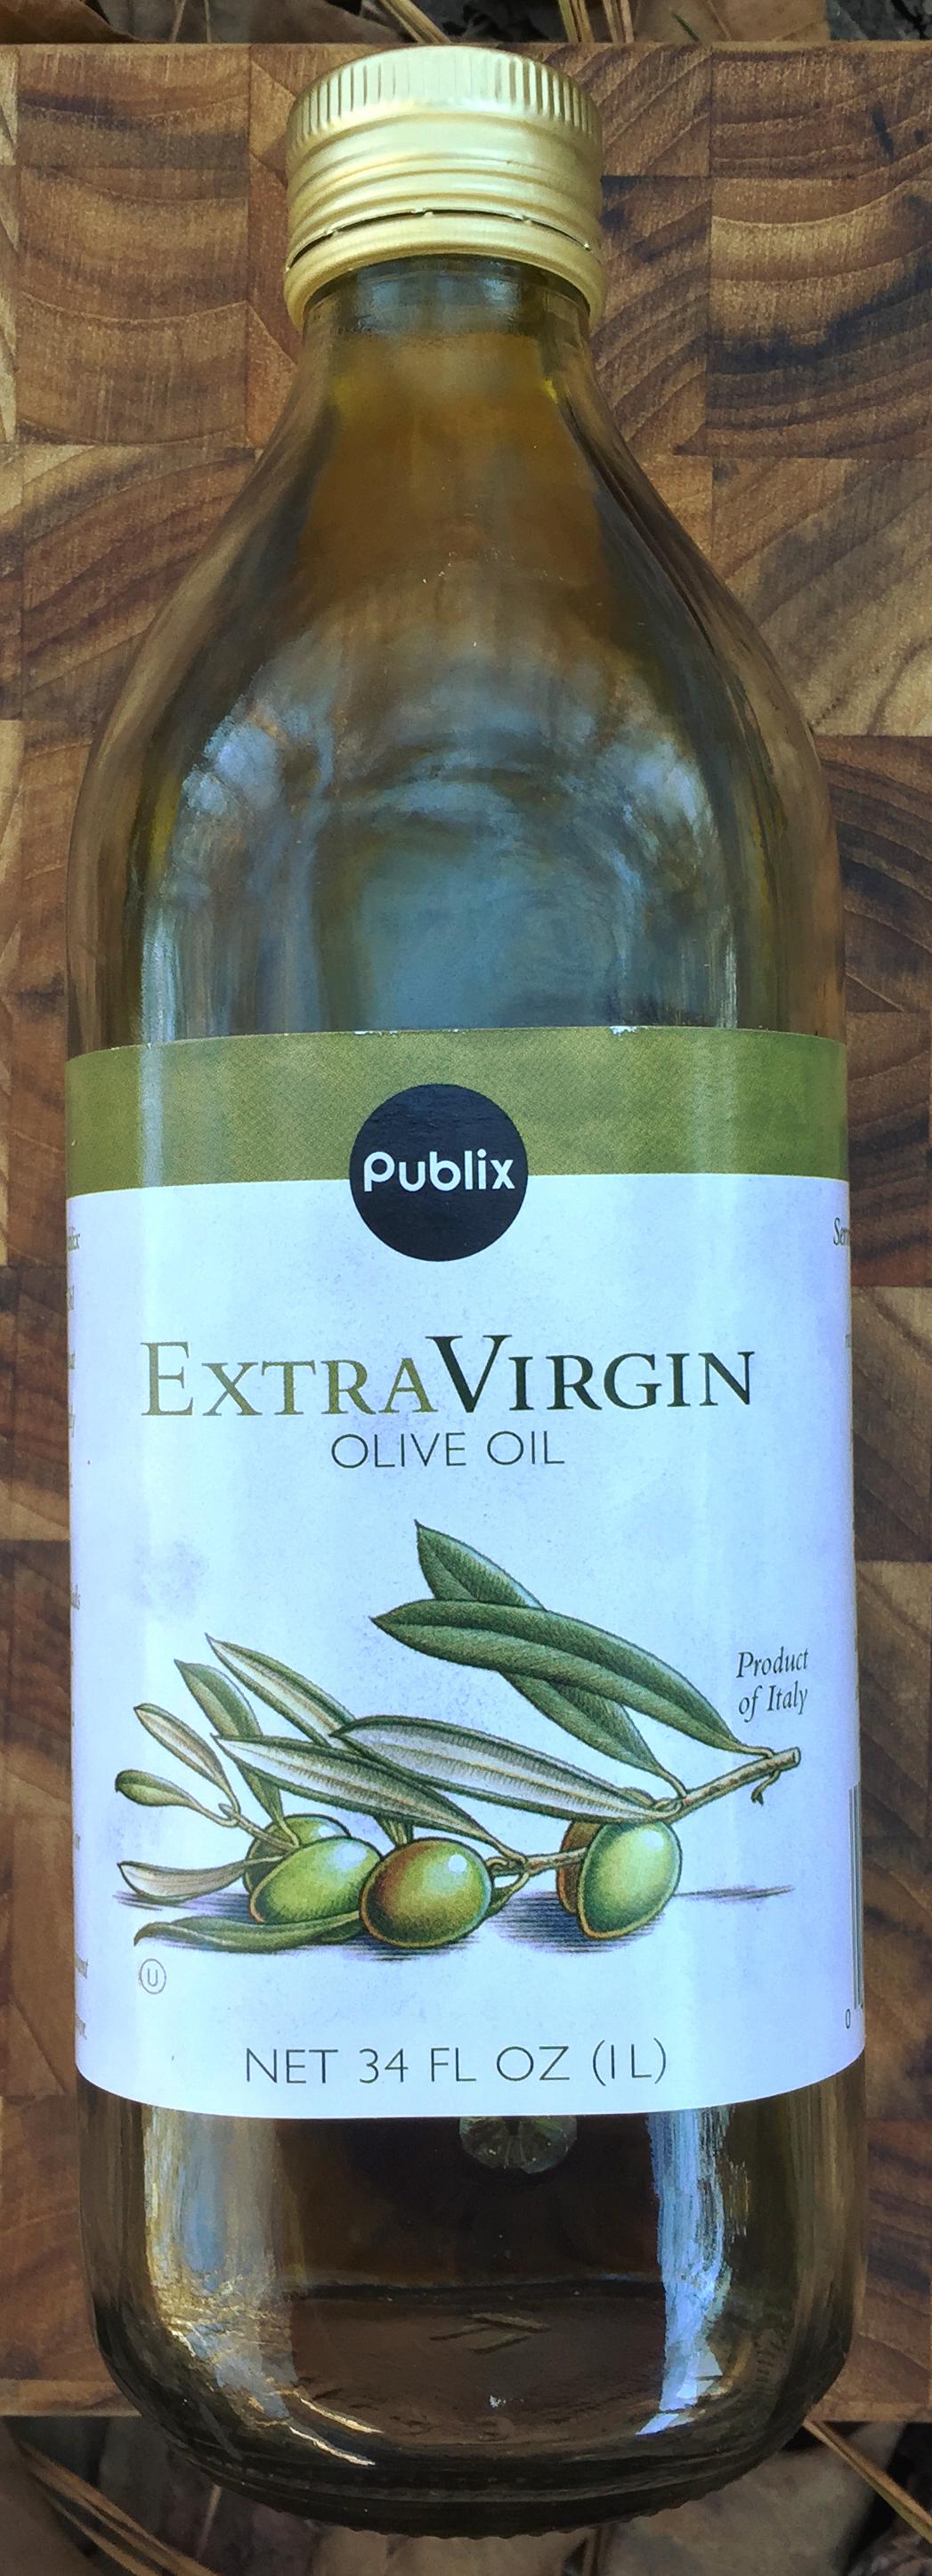 It's Olive Oil!